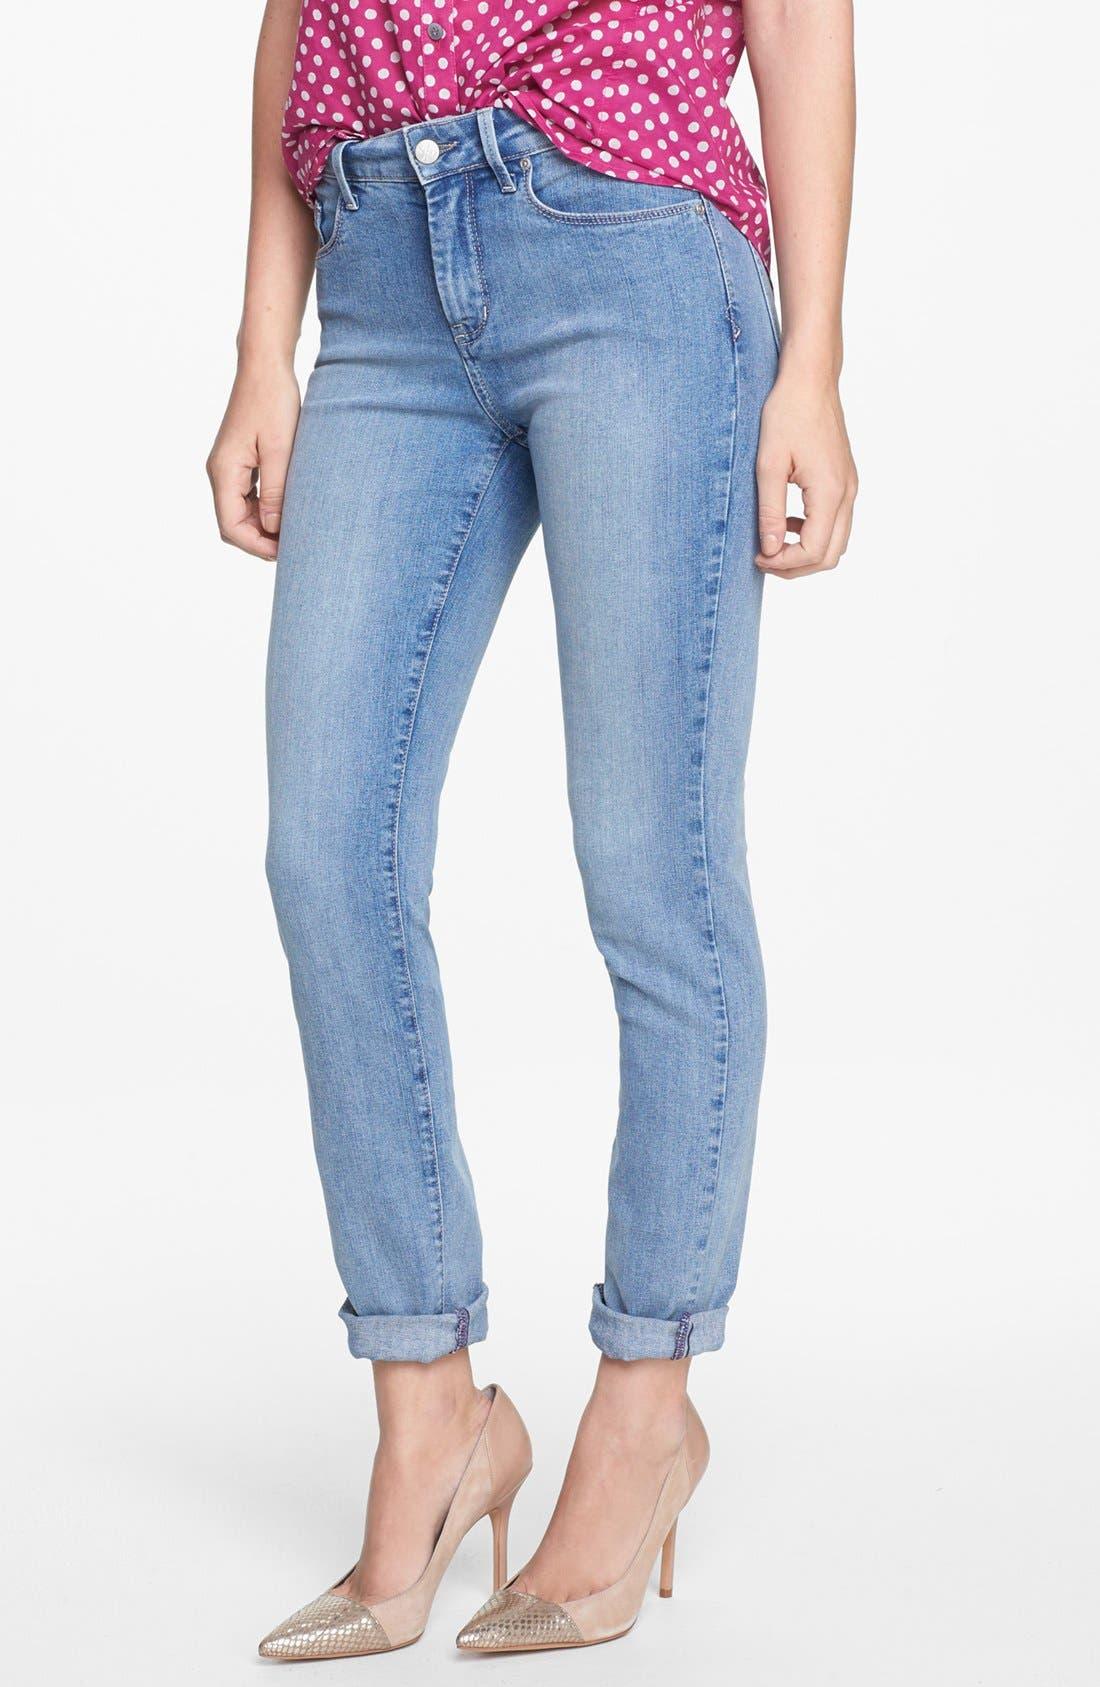 Main Image - NYDJ 'Anabelle' Stretch Skinny Jeans (Sacramento)